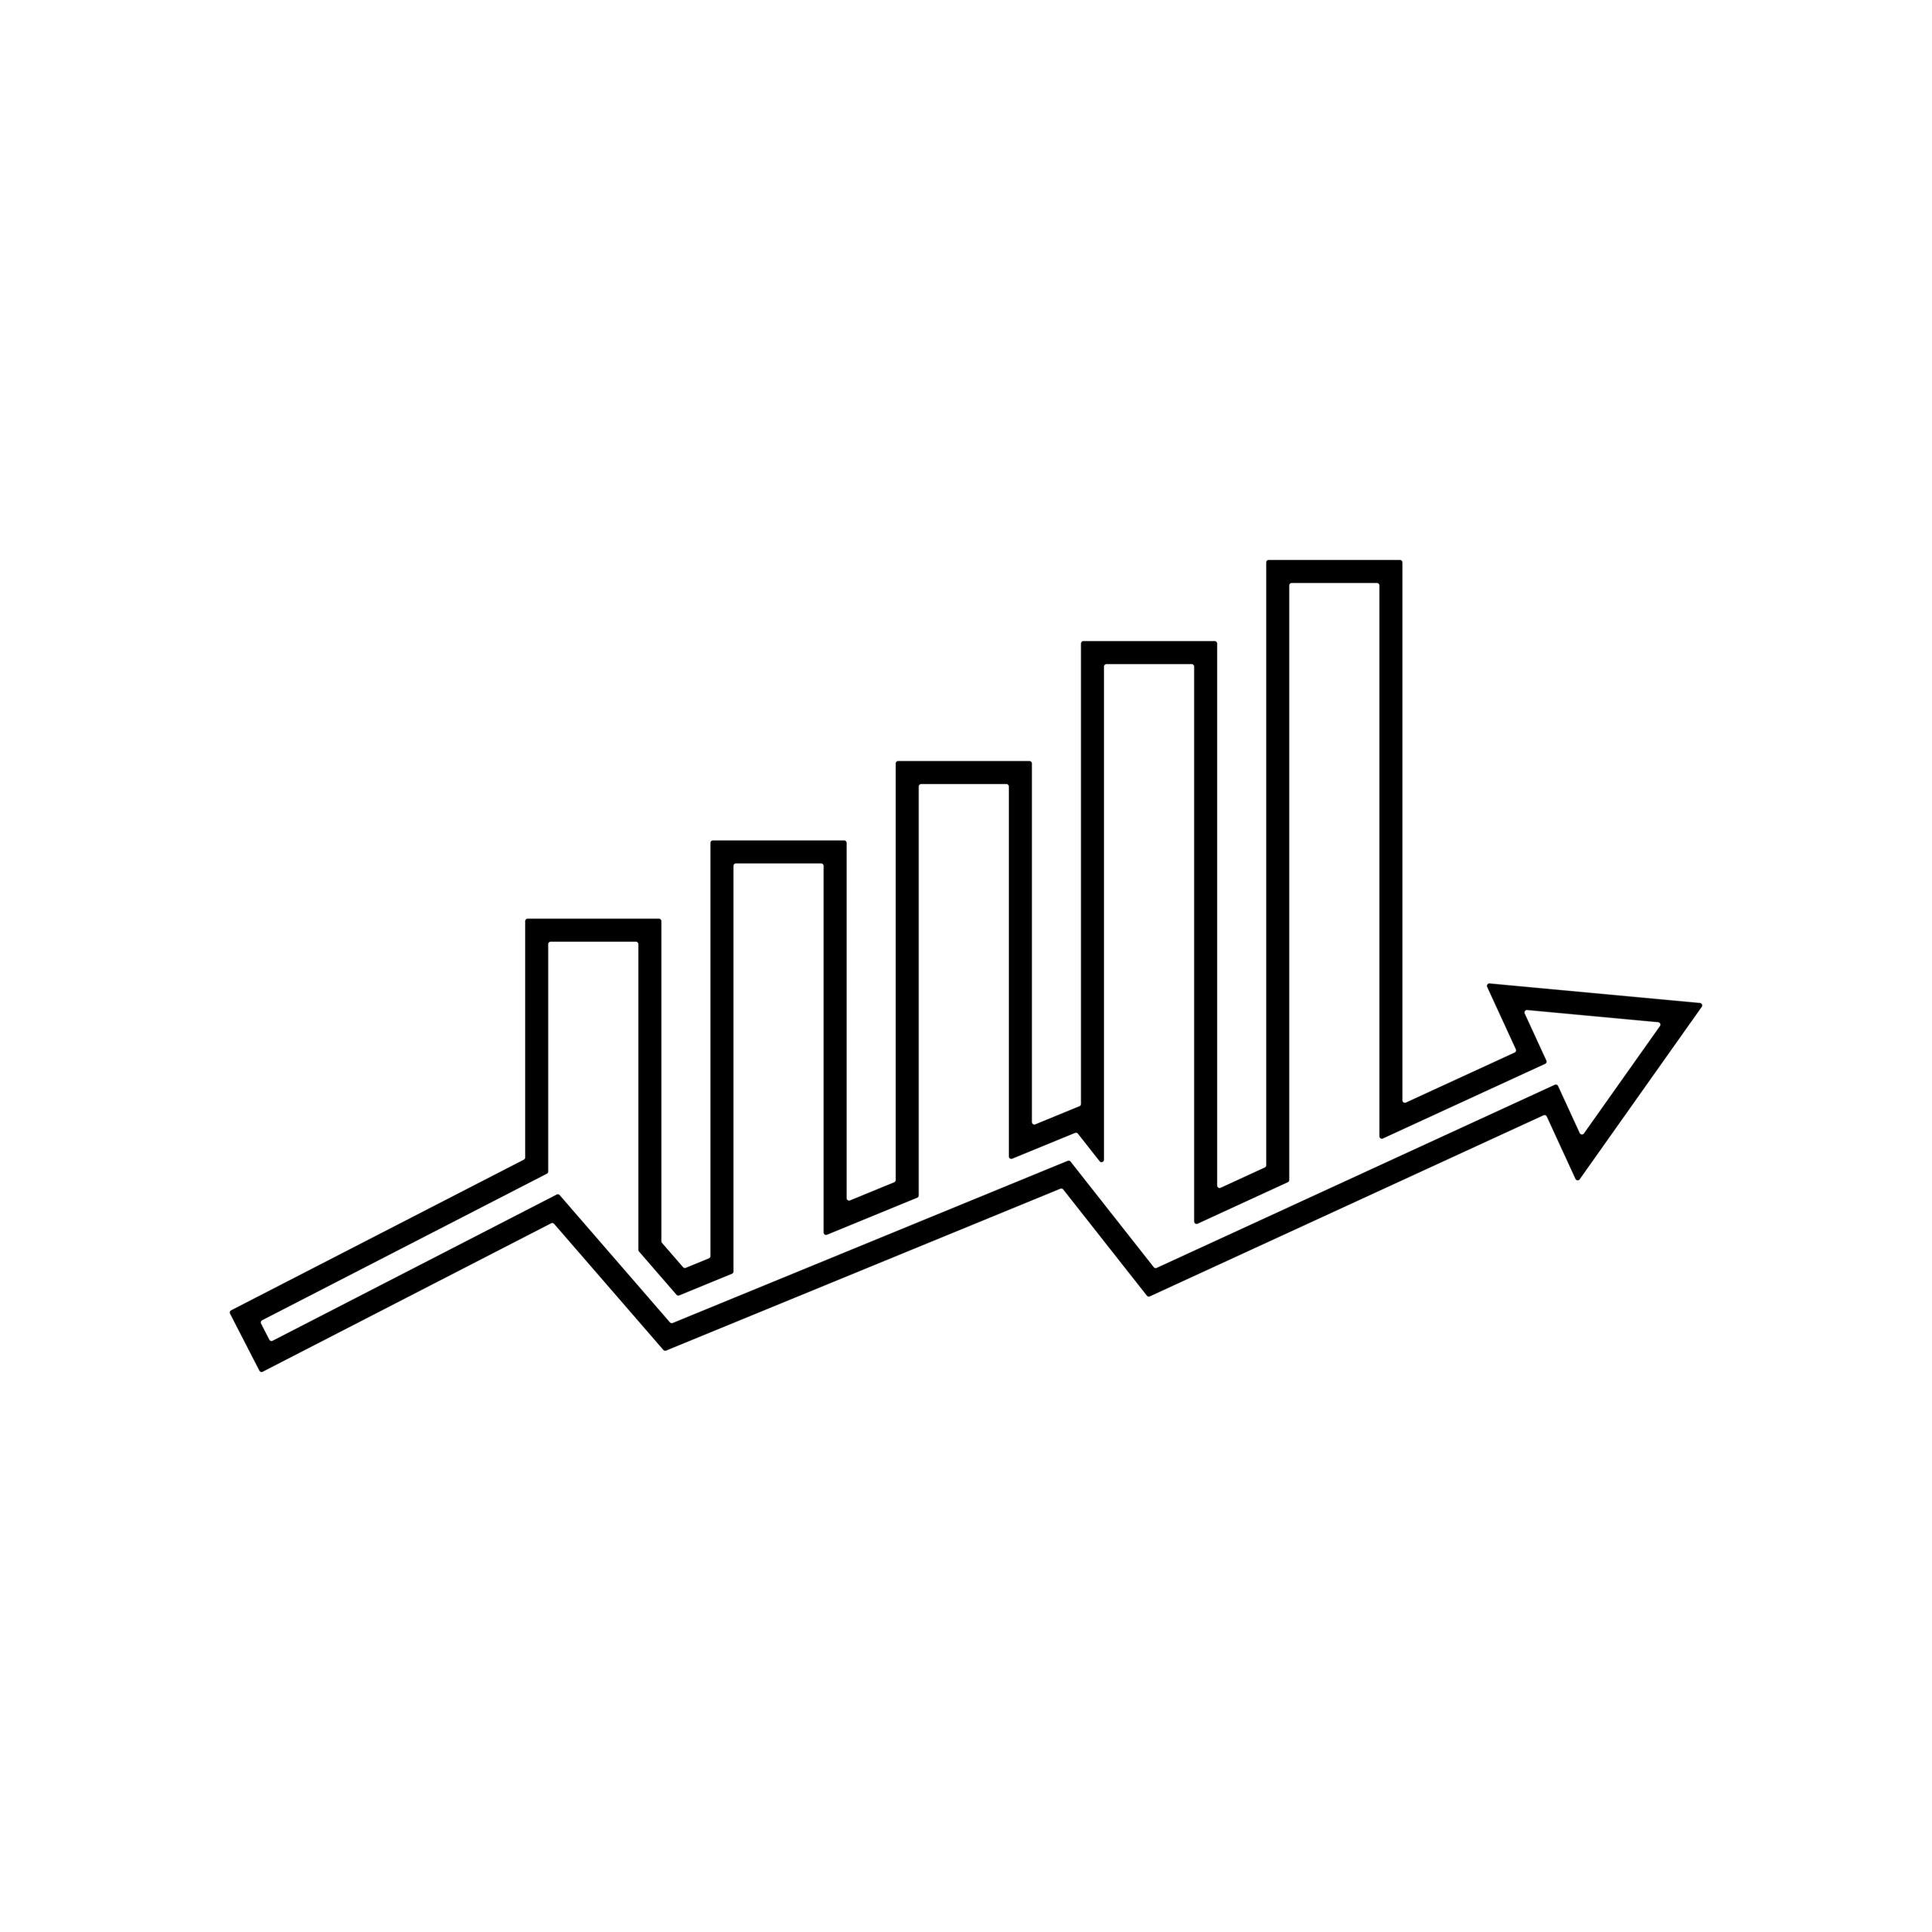 bigstock-Bar-Chart-And-Arrow-Going-Upwa-402418808